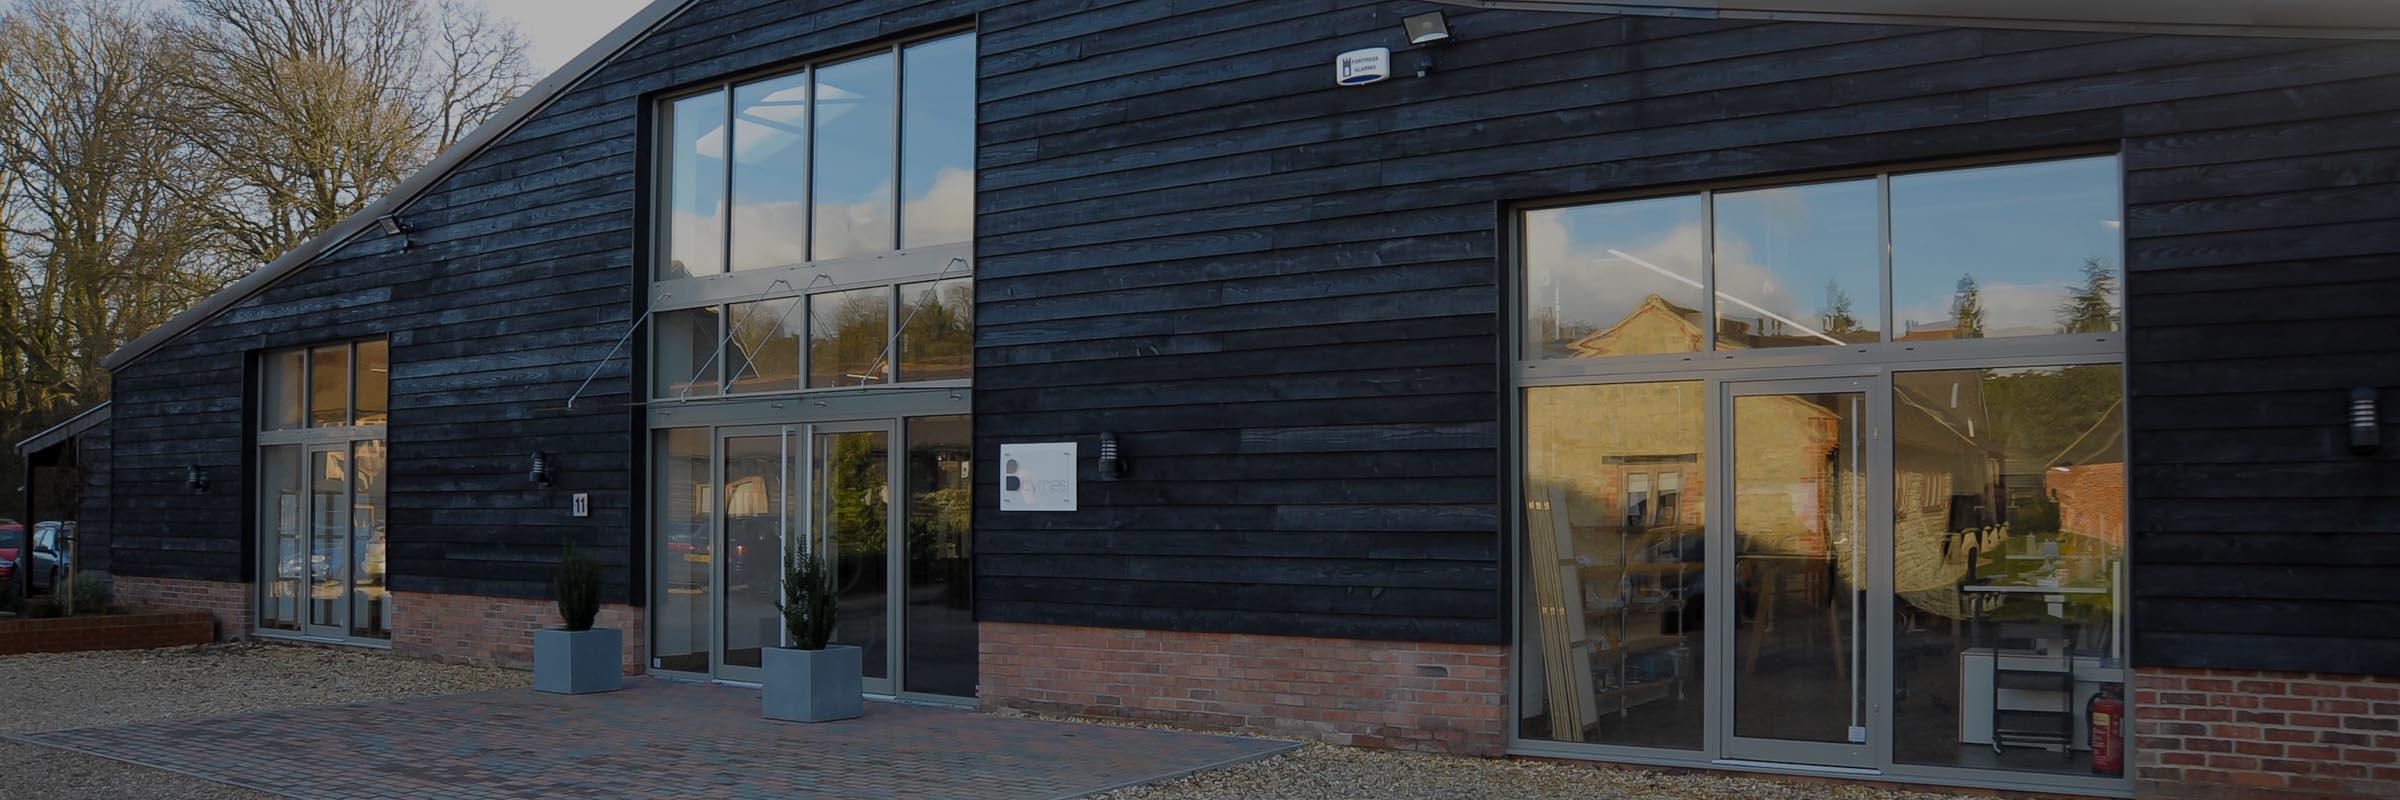 exterior photgraph of Byrnes Dental Lab